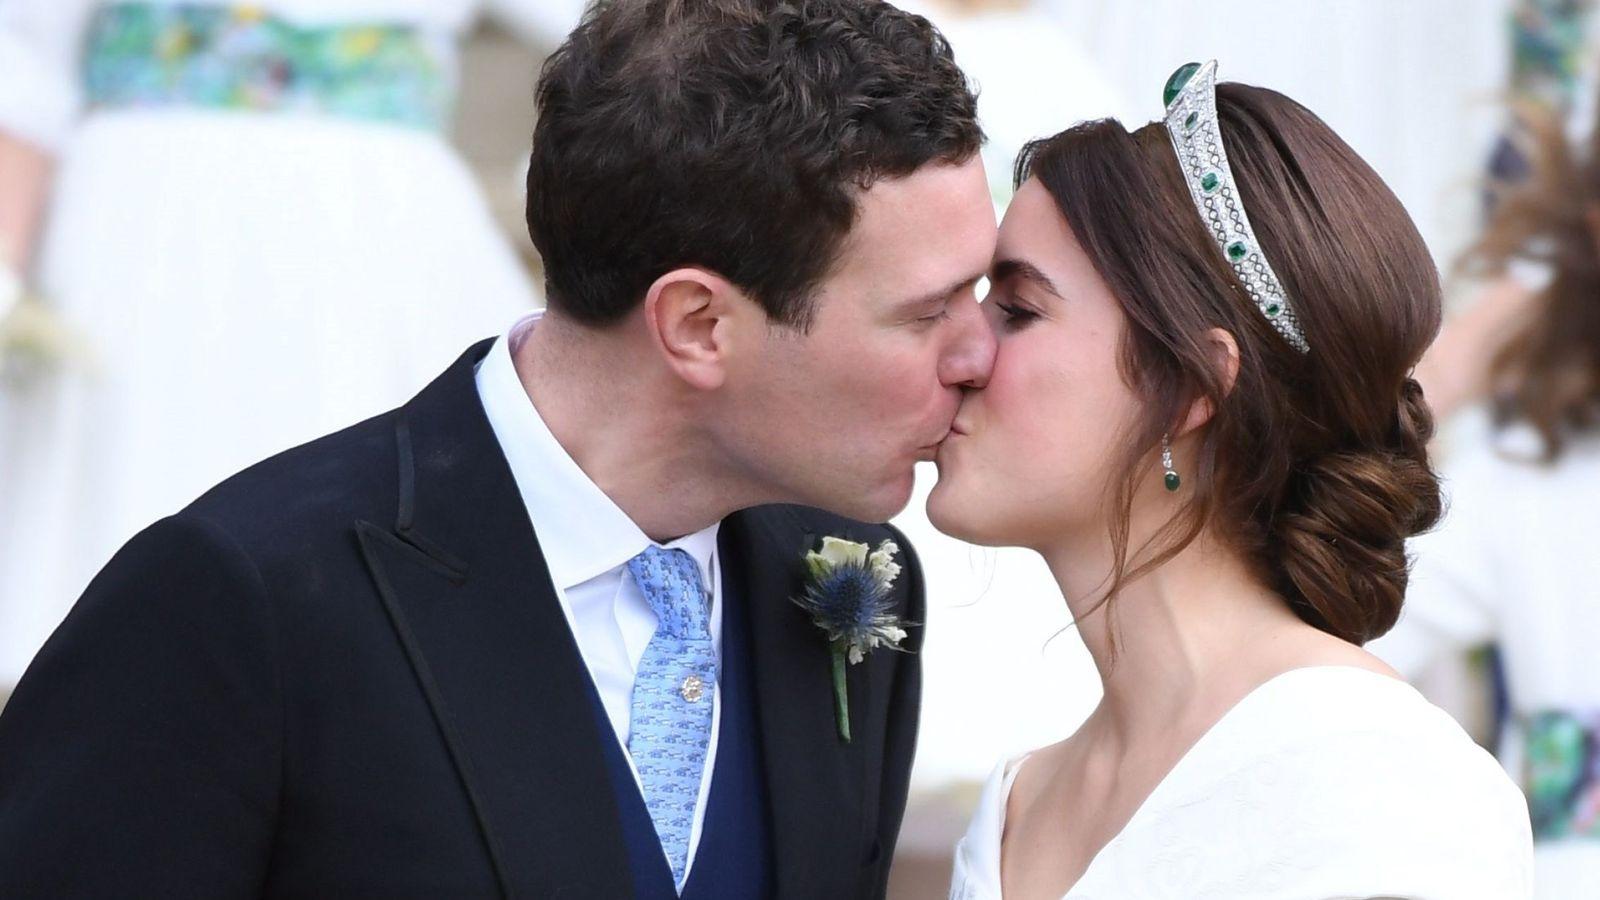 Foto: Boda de la princesa Eugenia con Jack Brooksbank. (EFE)